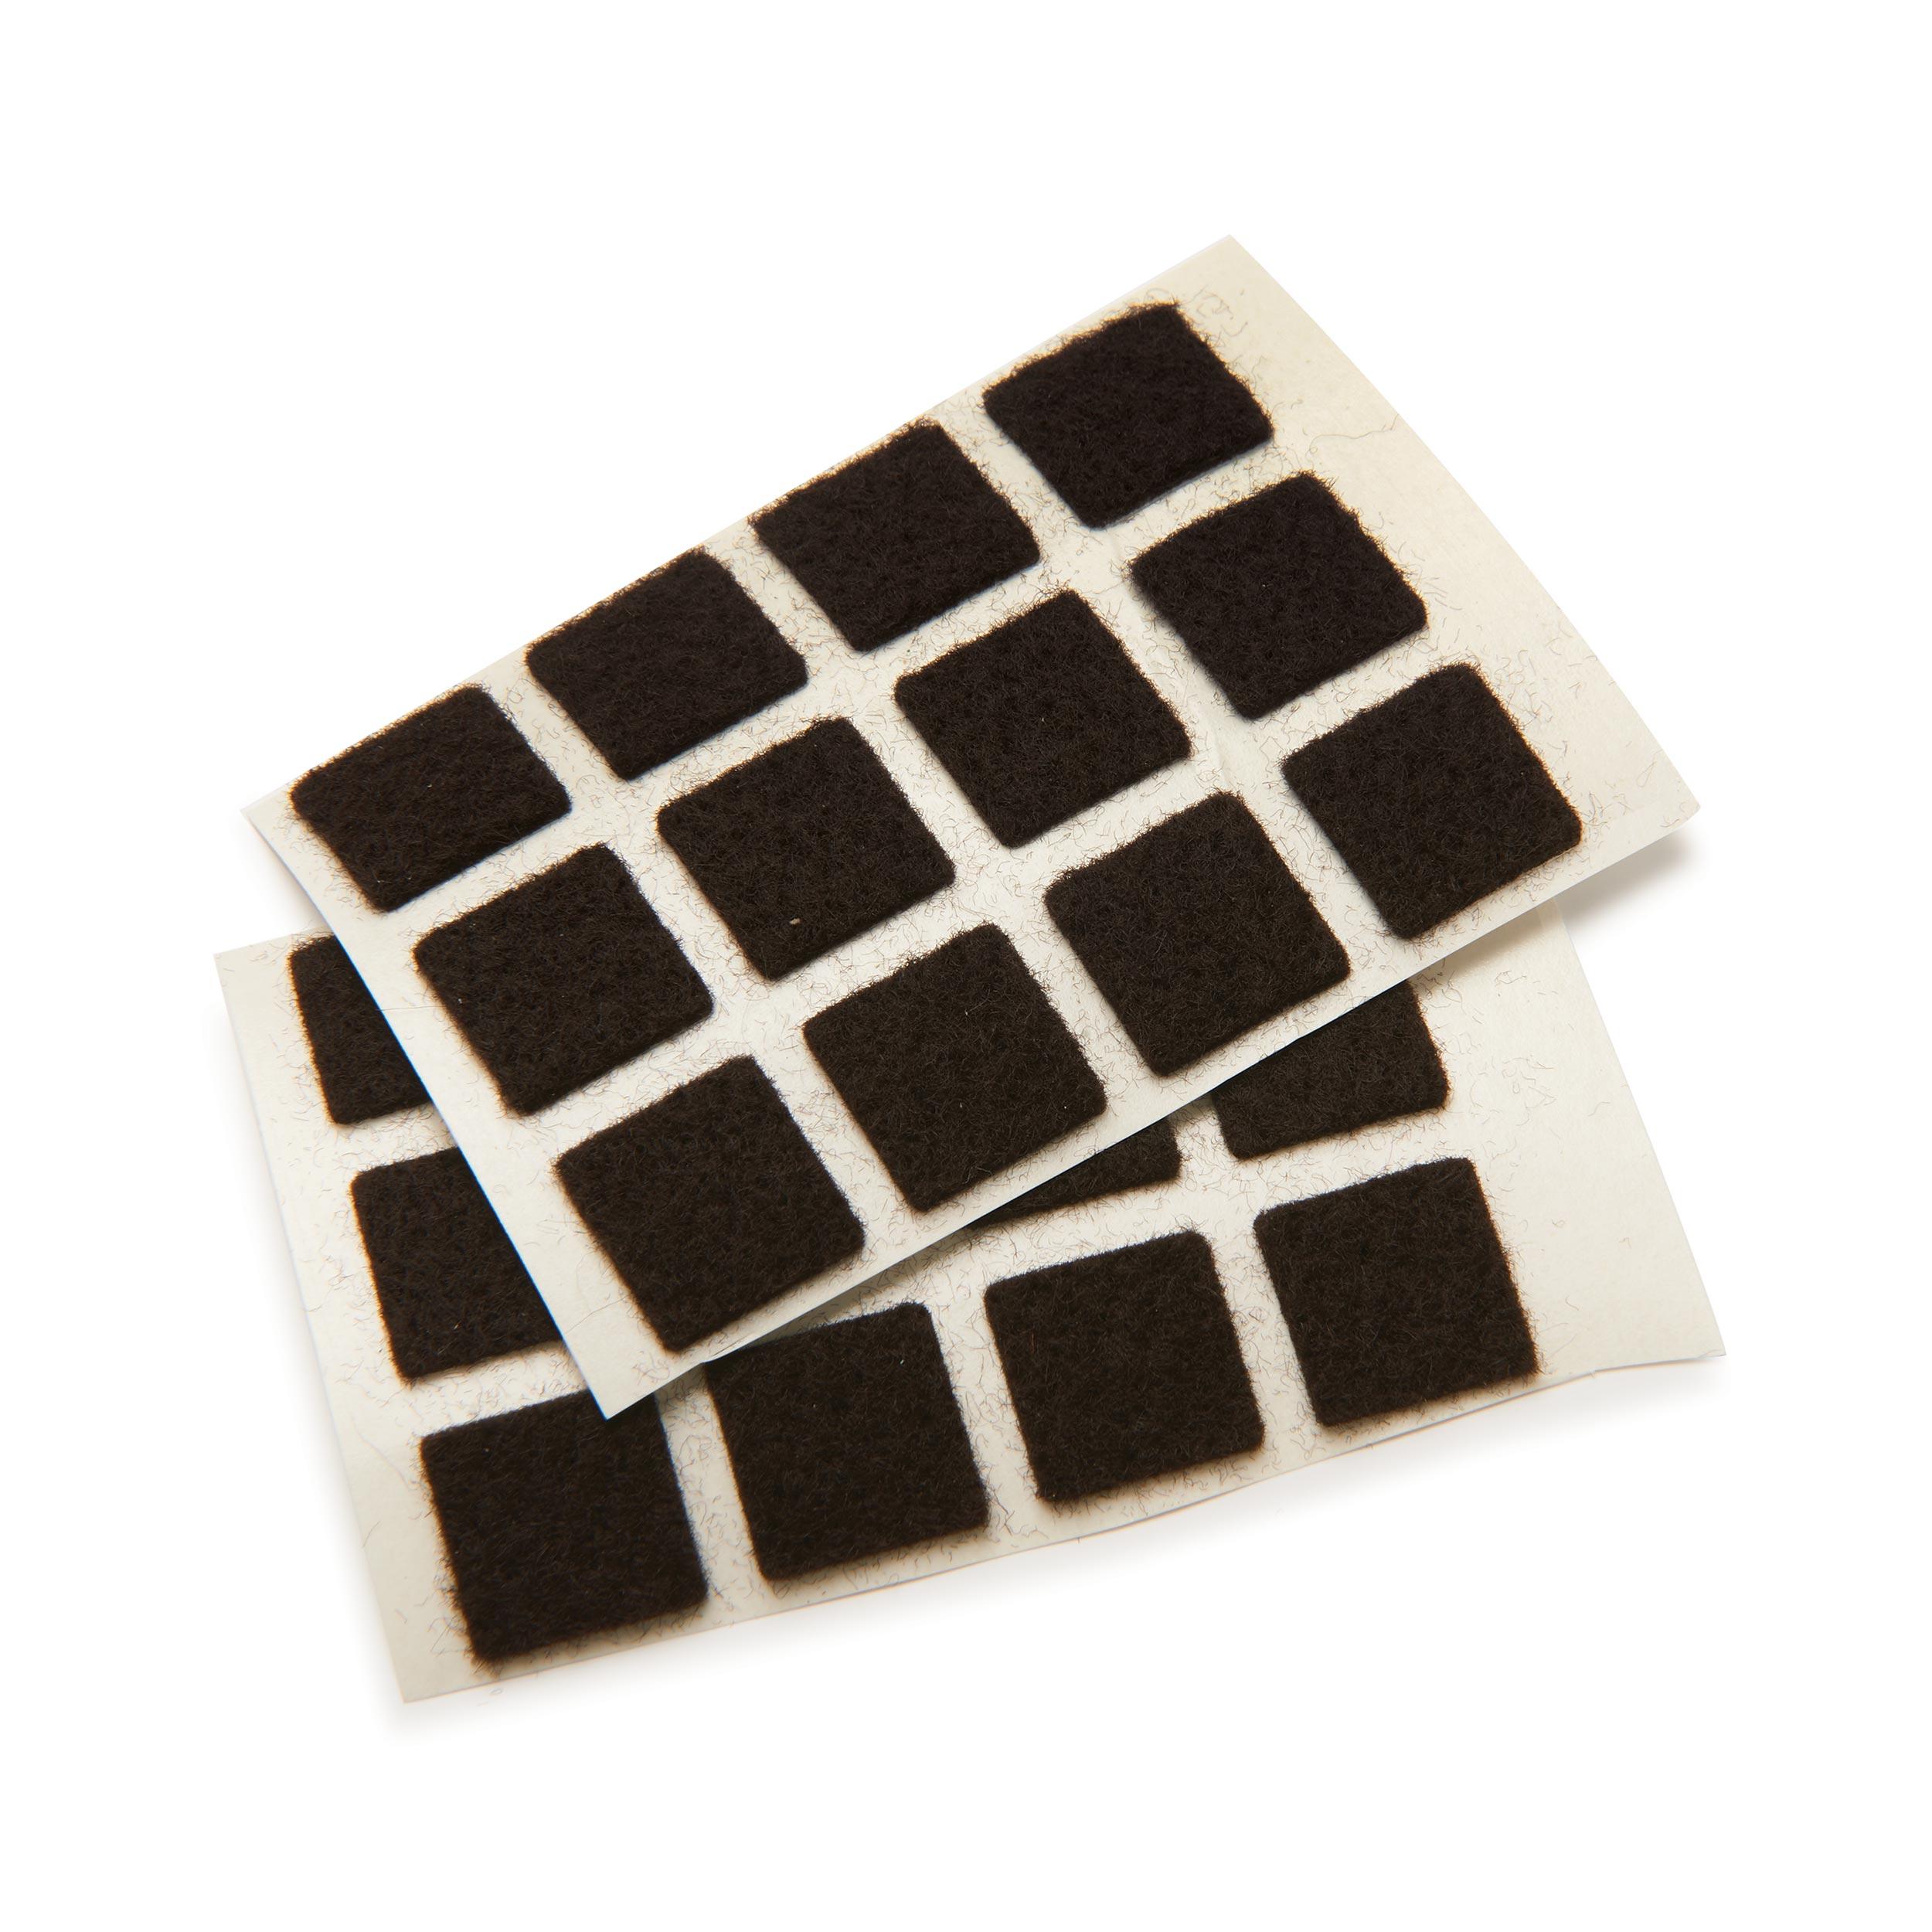 Felt Square, Self-Adhesive, Black 1/2